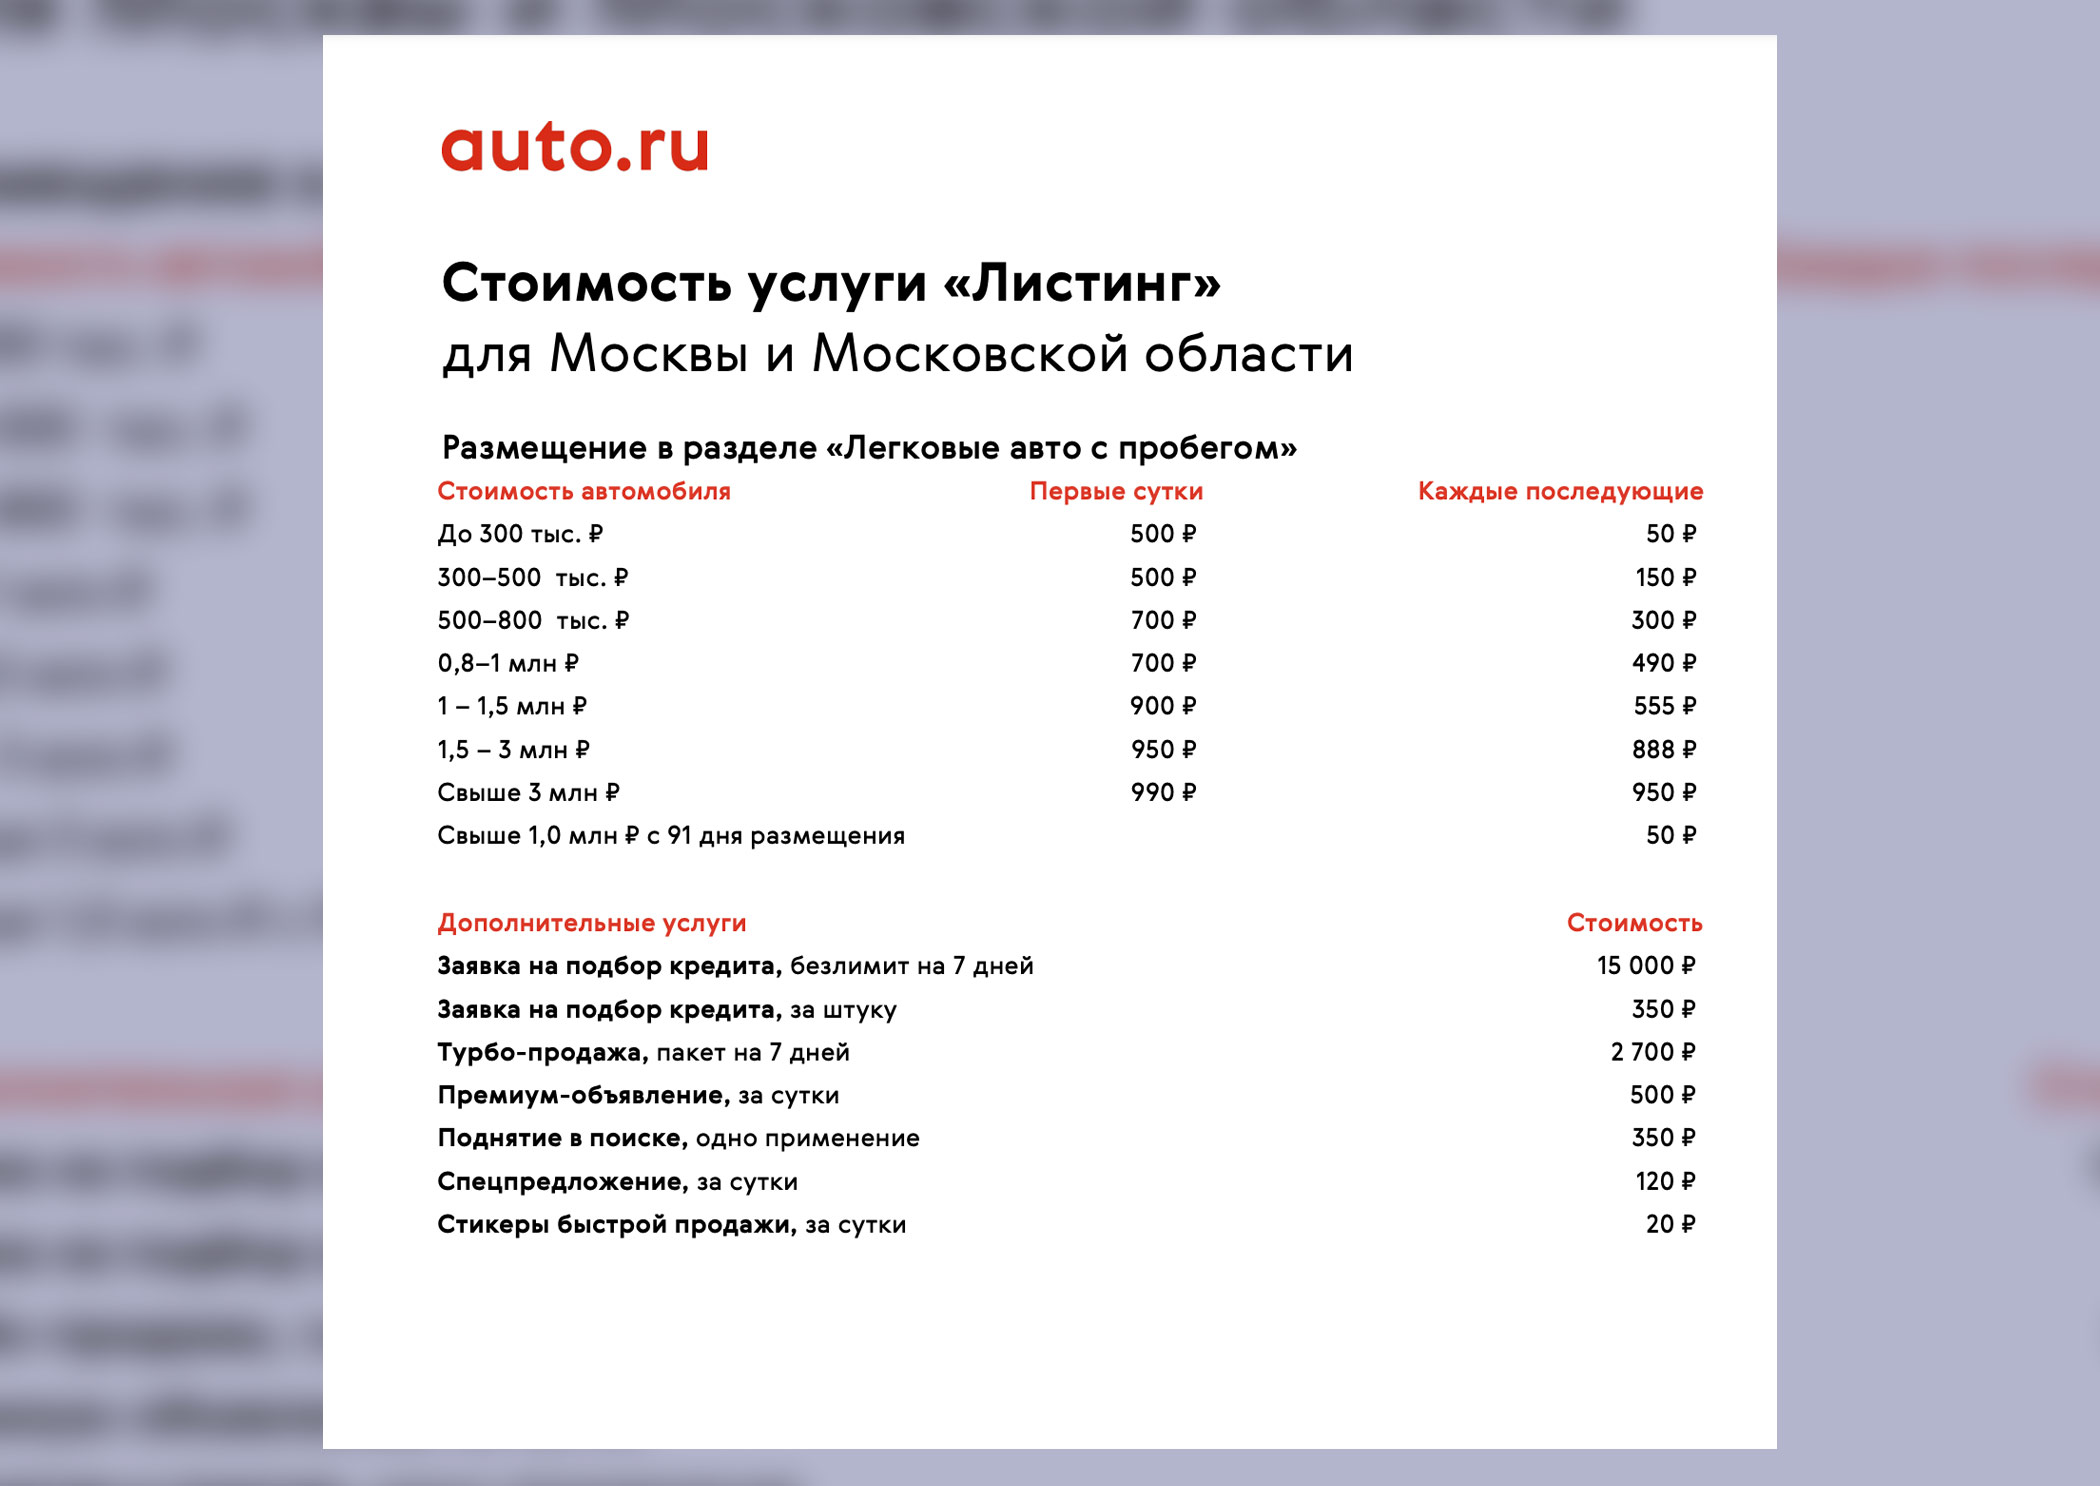 ©auto.ru